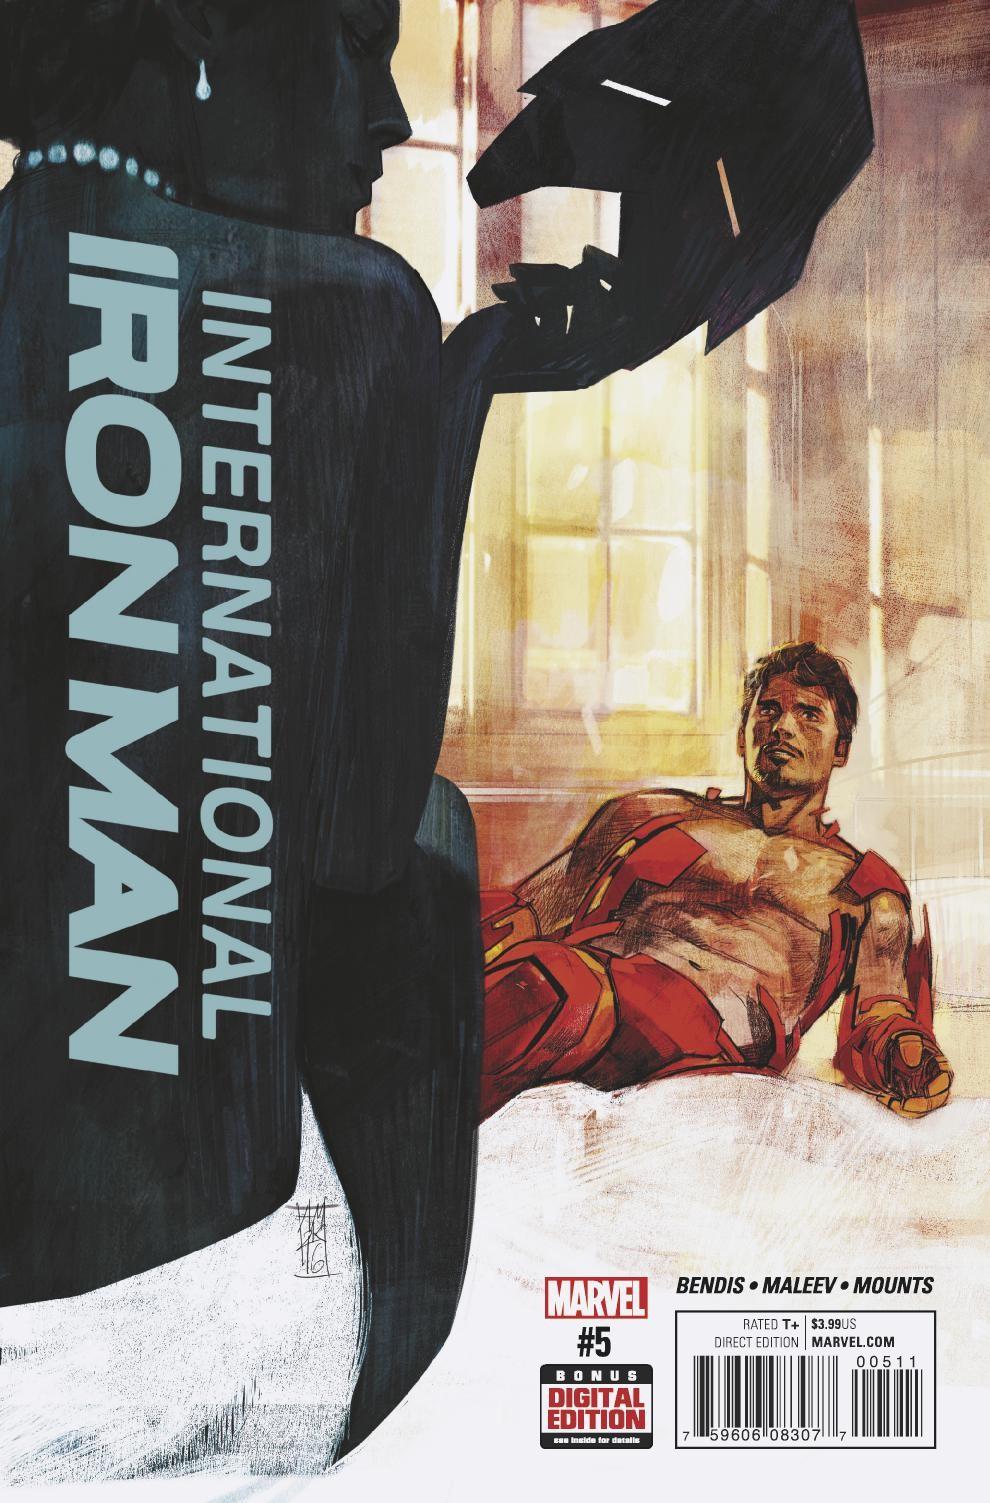 Tony Stark Meets His Mother in International Iron Man #5